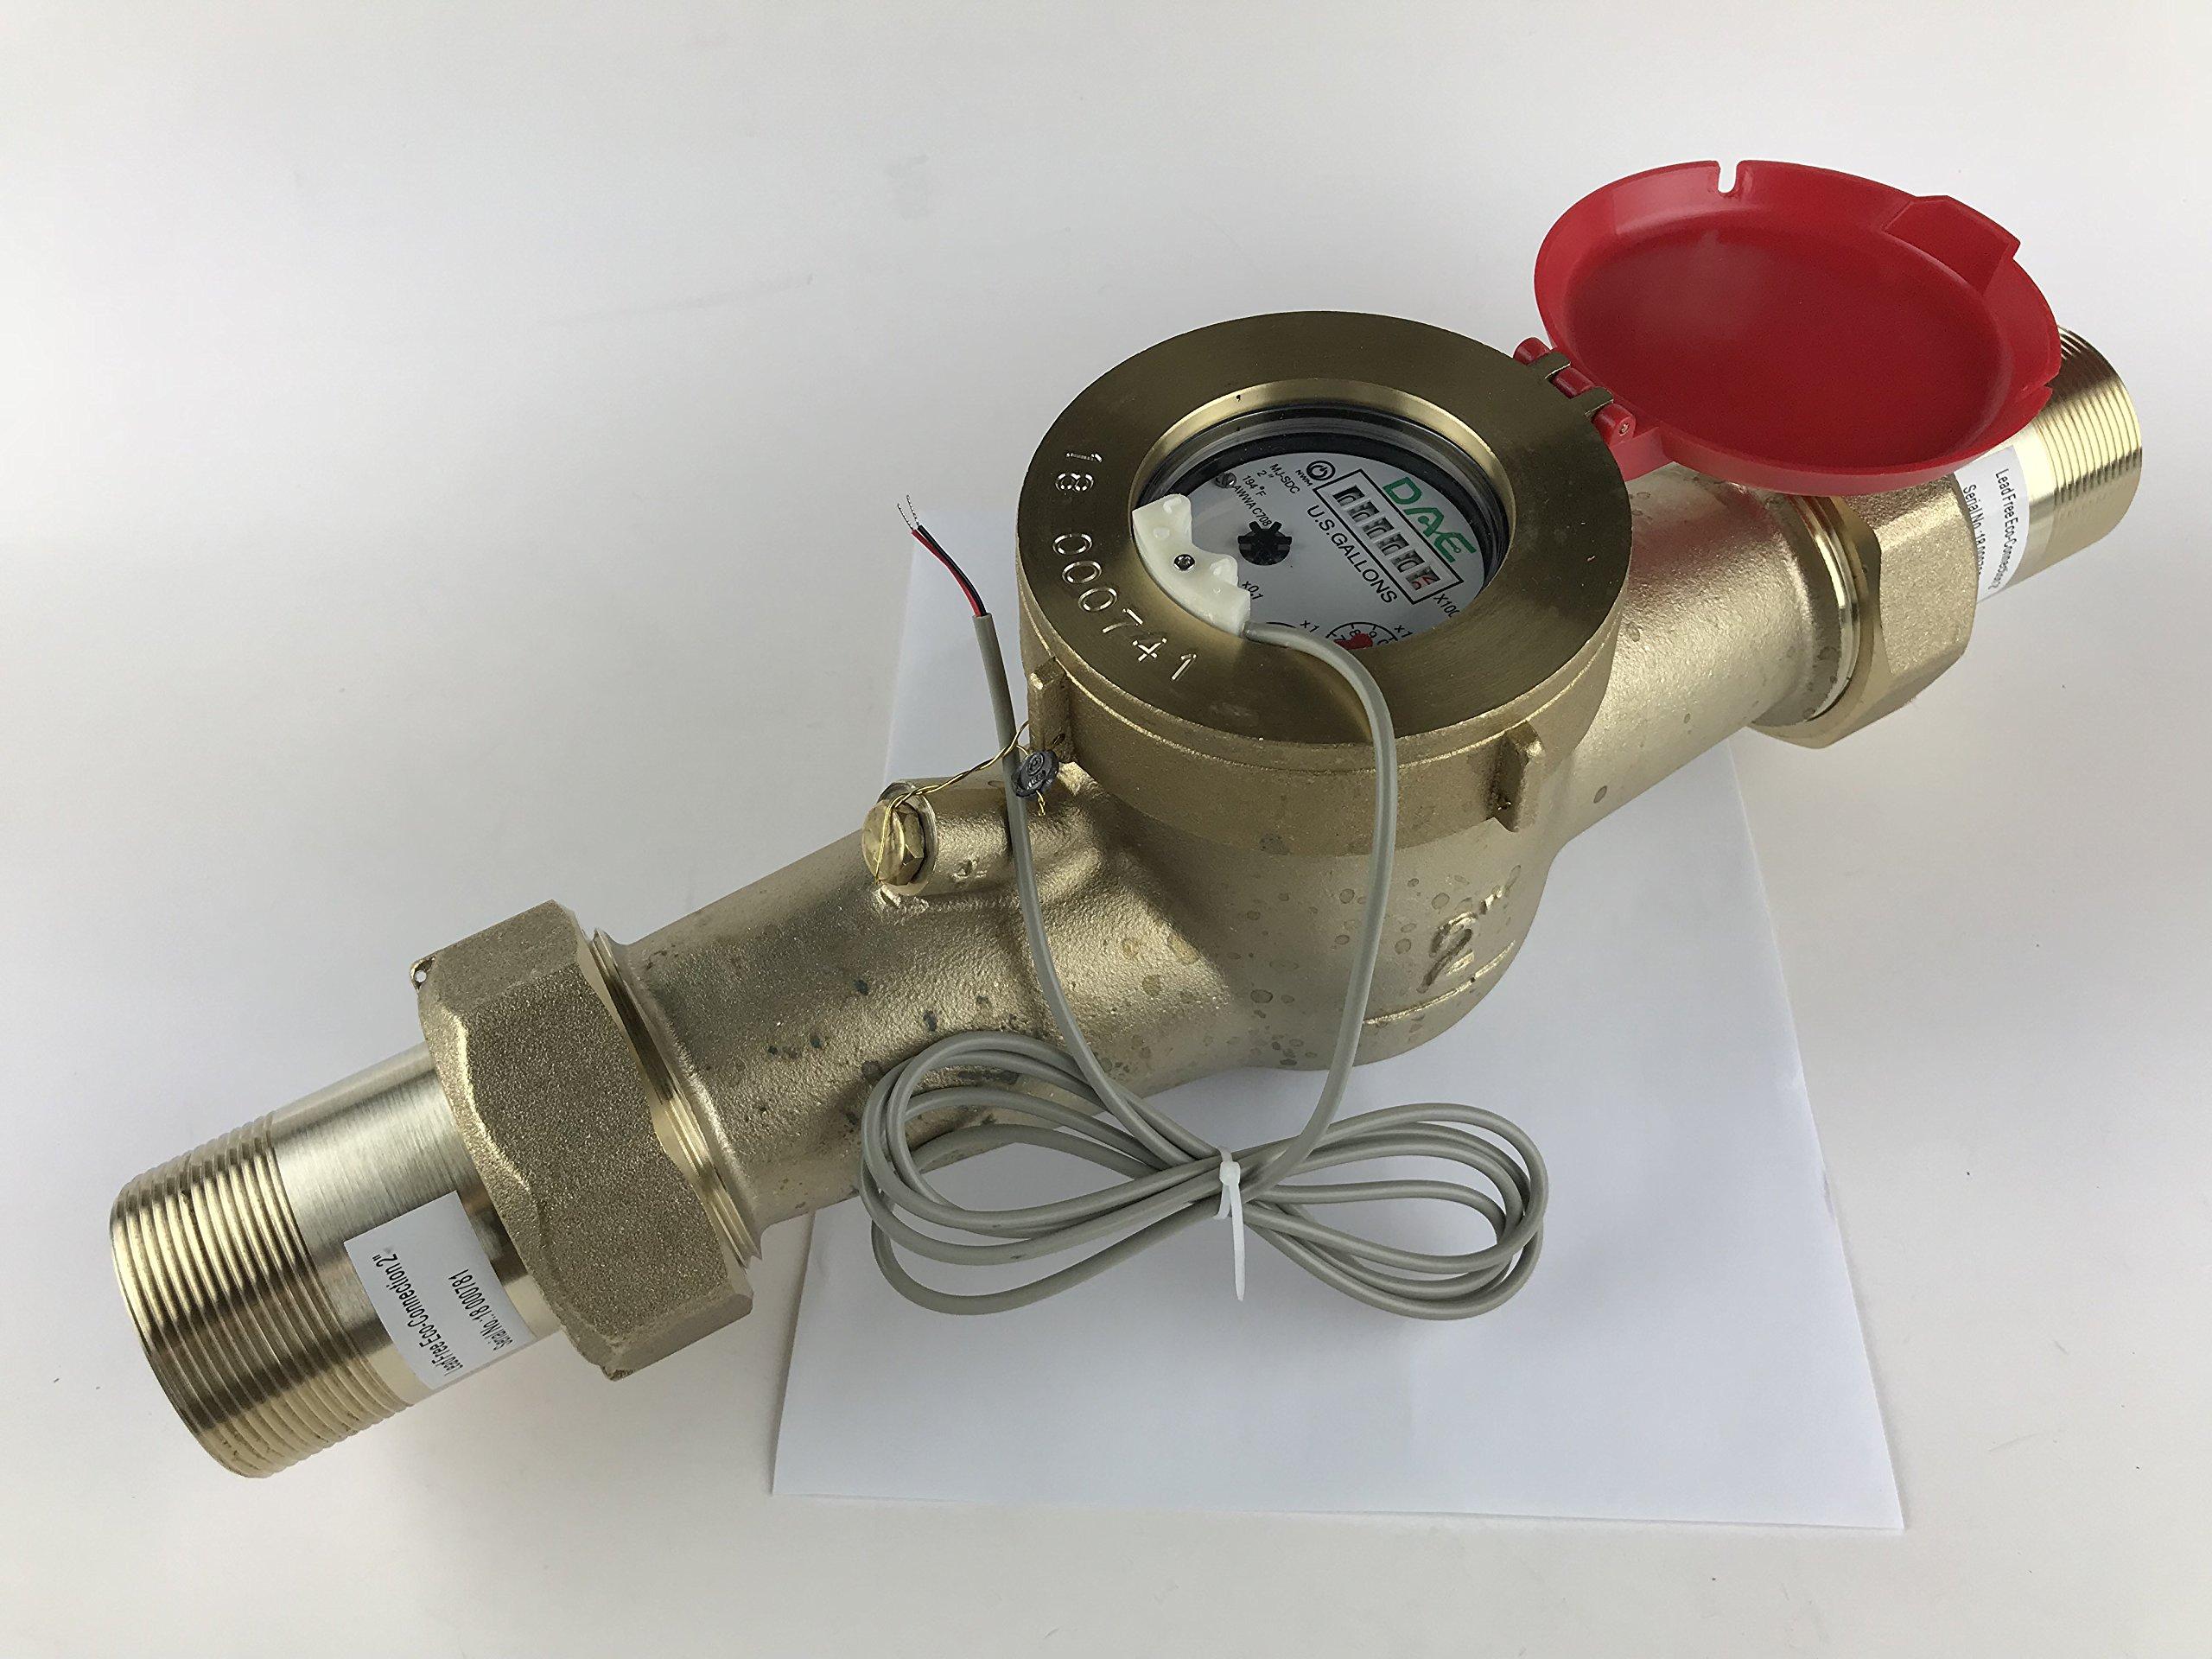 DAE MJ-200R 2'' Lead Free Hot Potable Water Meter, Pulse Output + Couplings